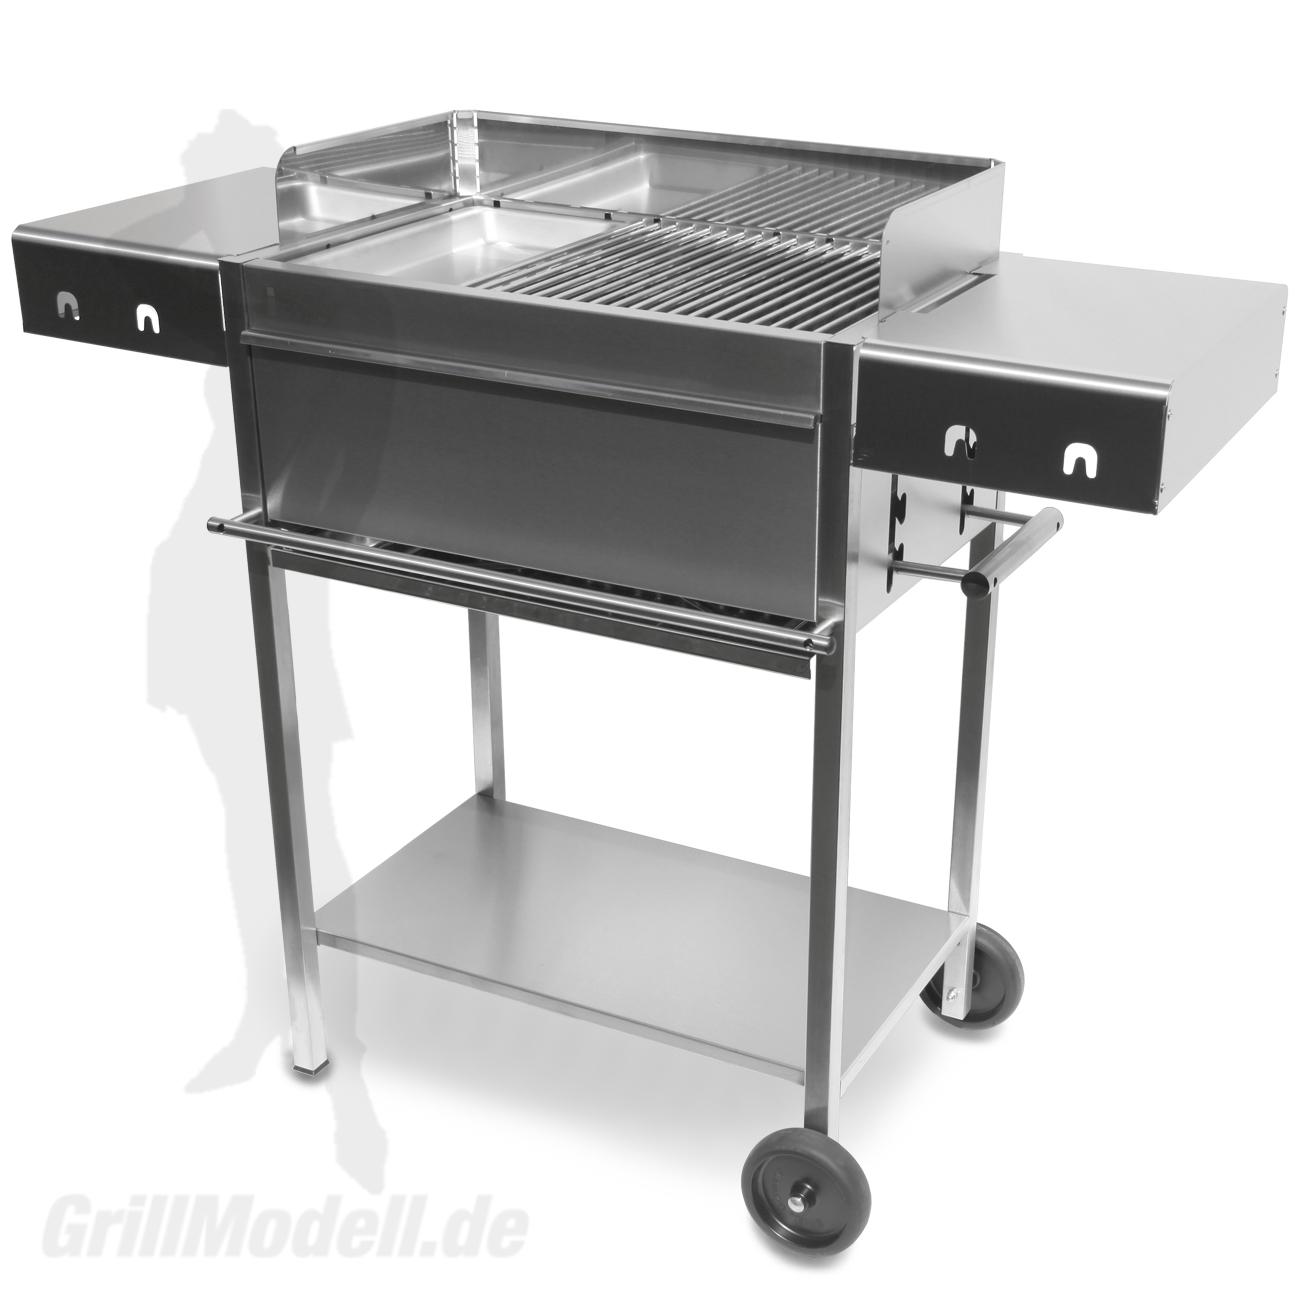 Holzkohlegrill Edelstahlgrill Edelstar L Gourmet komplett aus Edelstahl mit Grillplatte